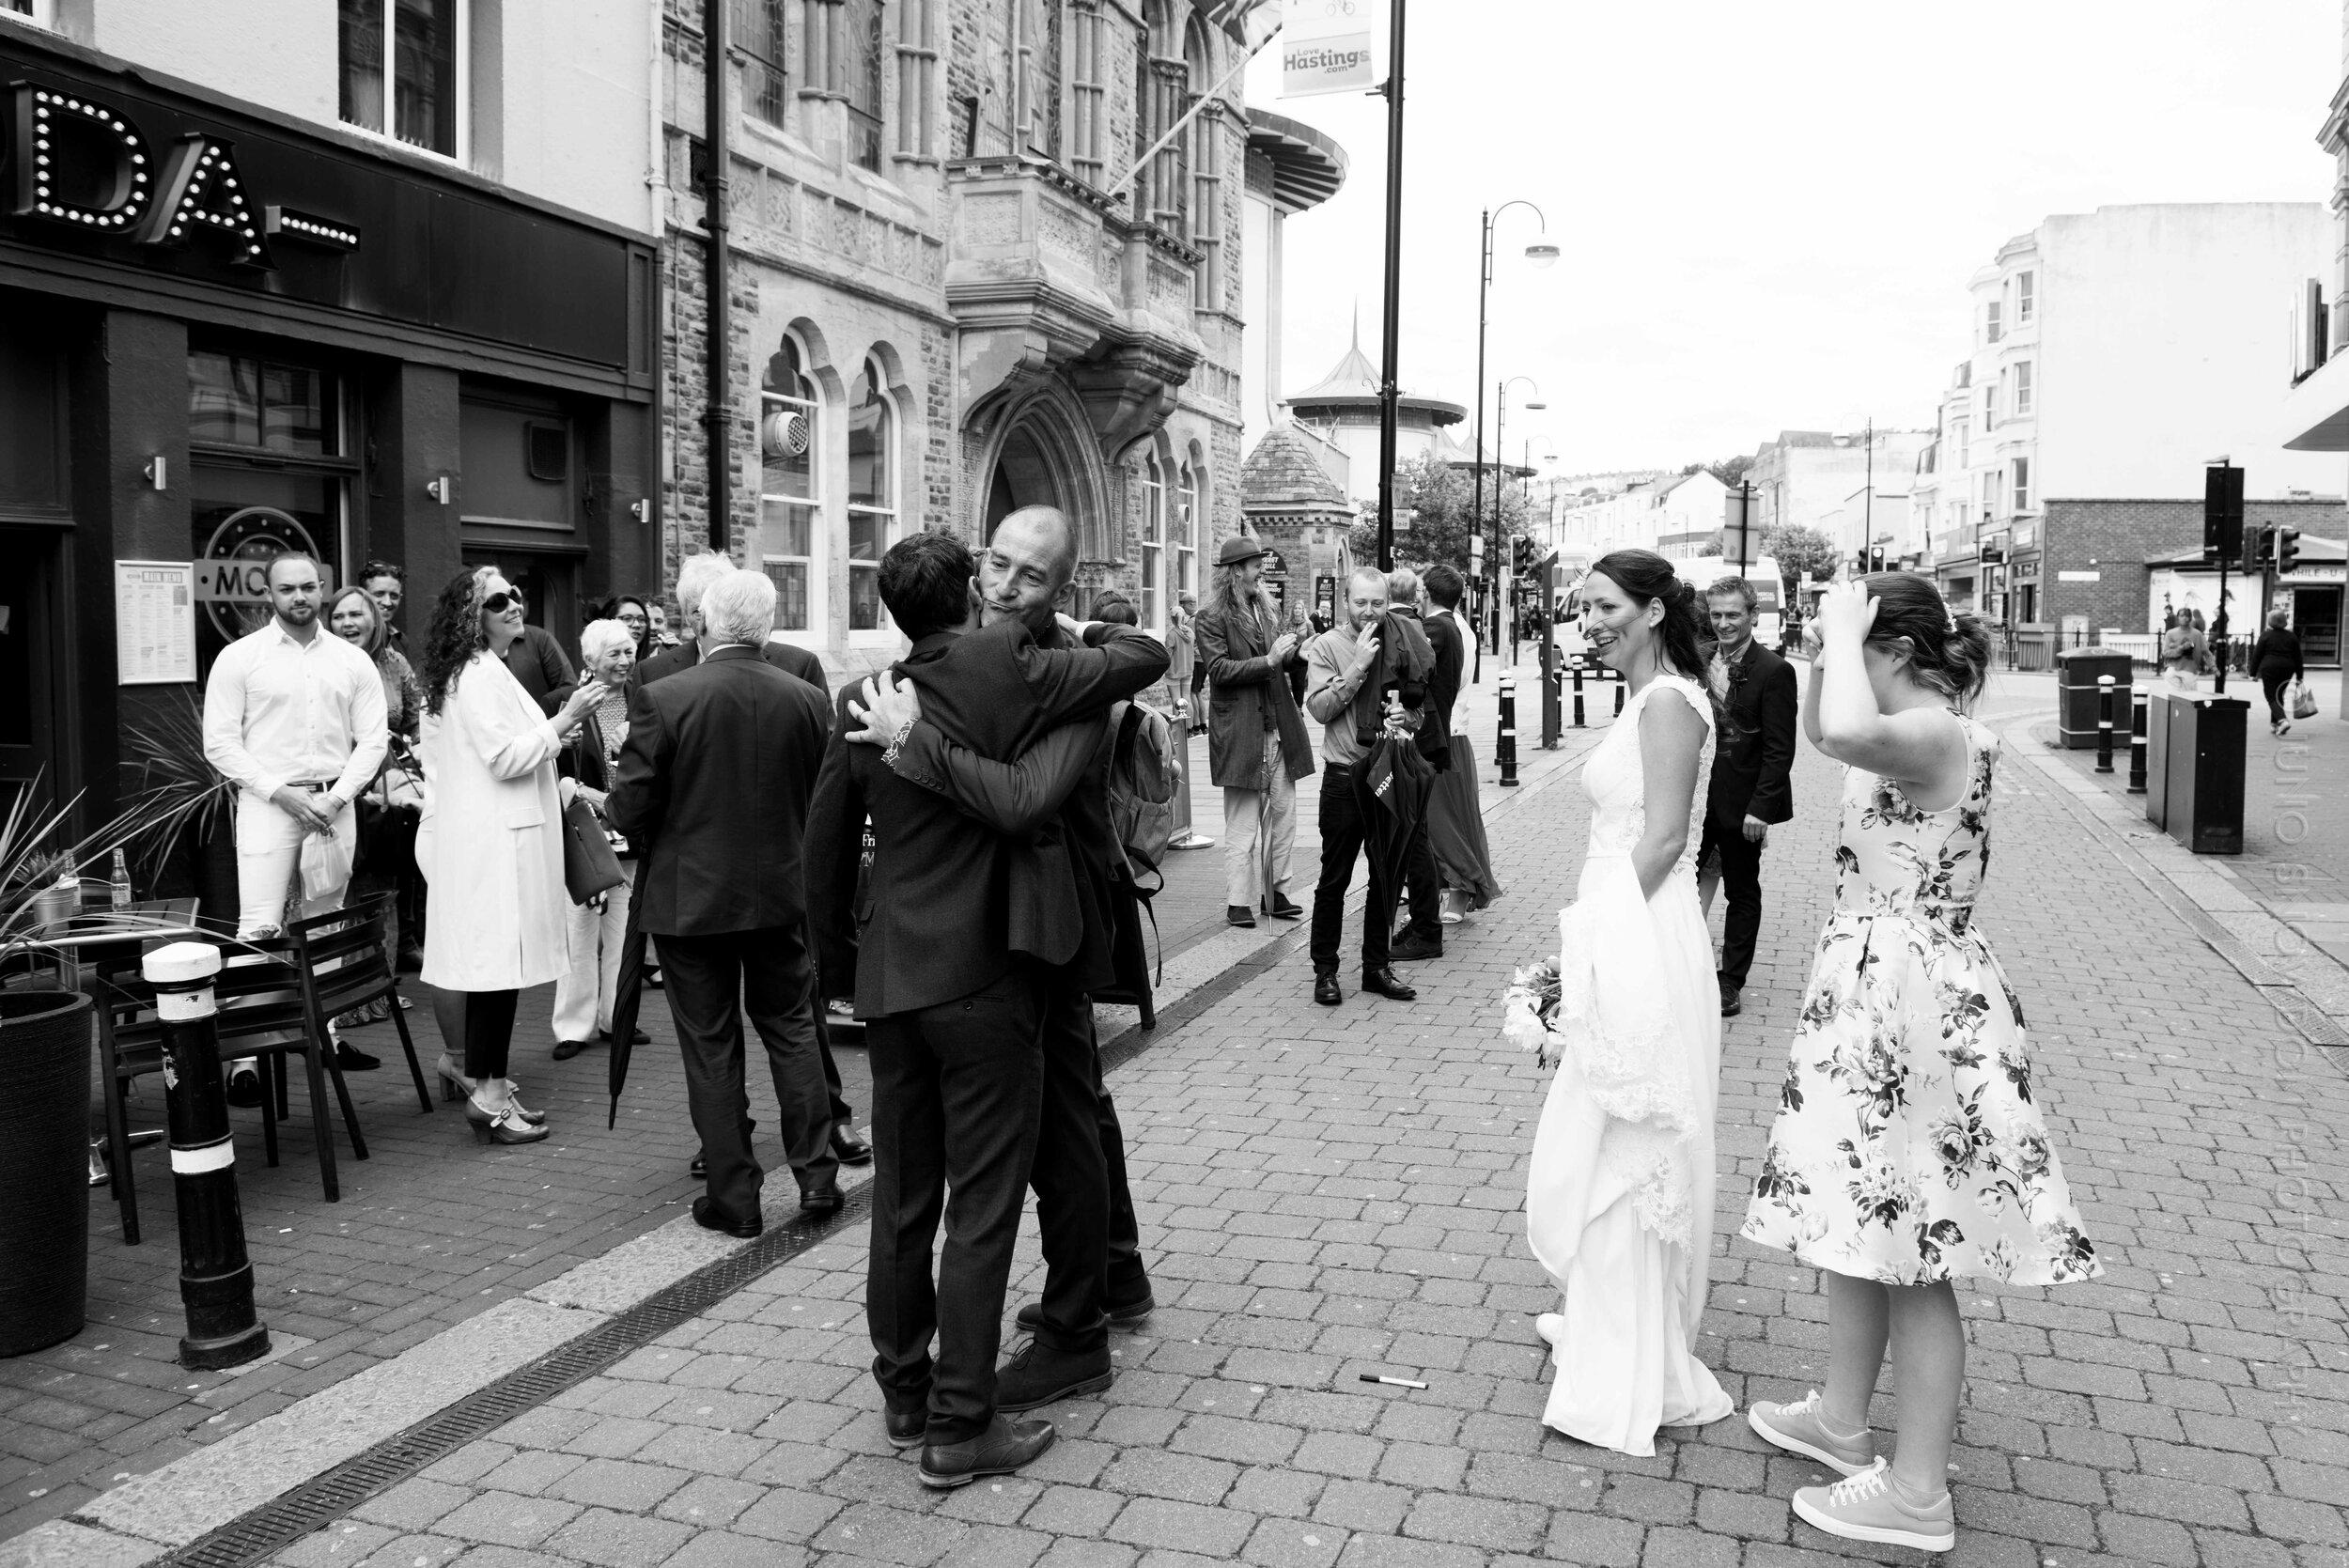 juno-snowdon-photography-wedding-7784.jpg